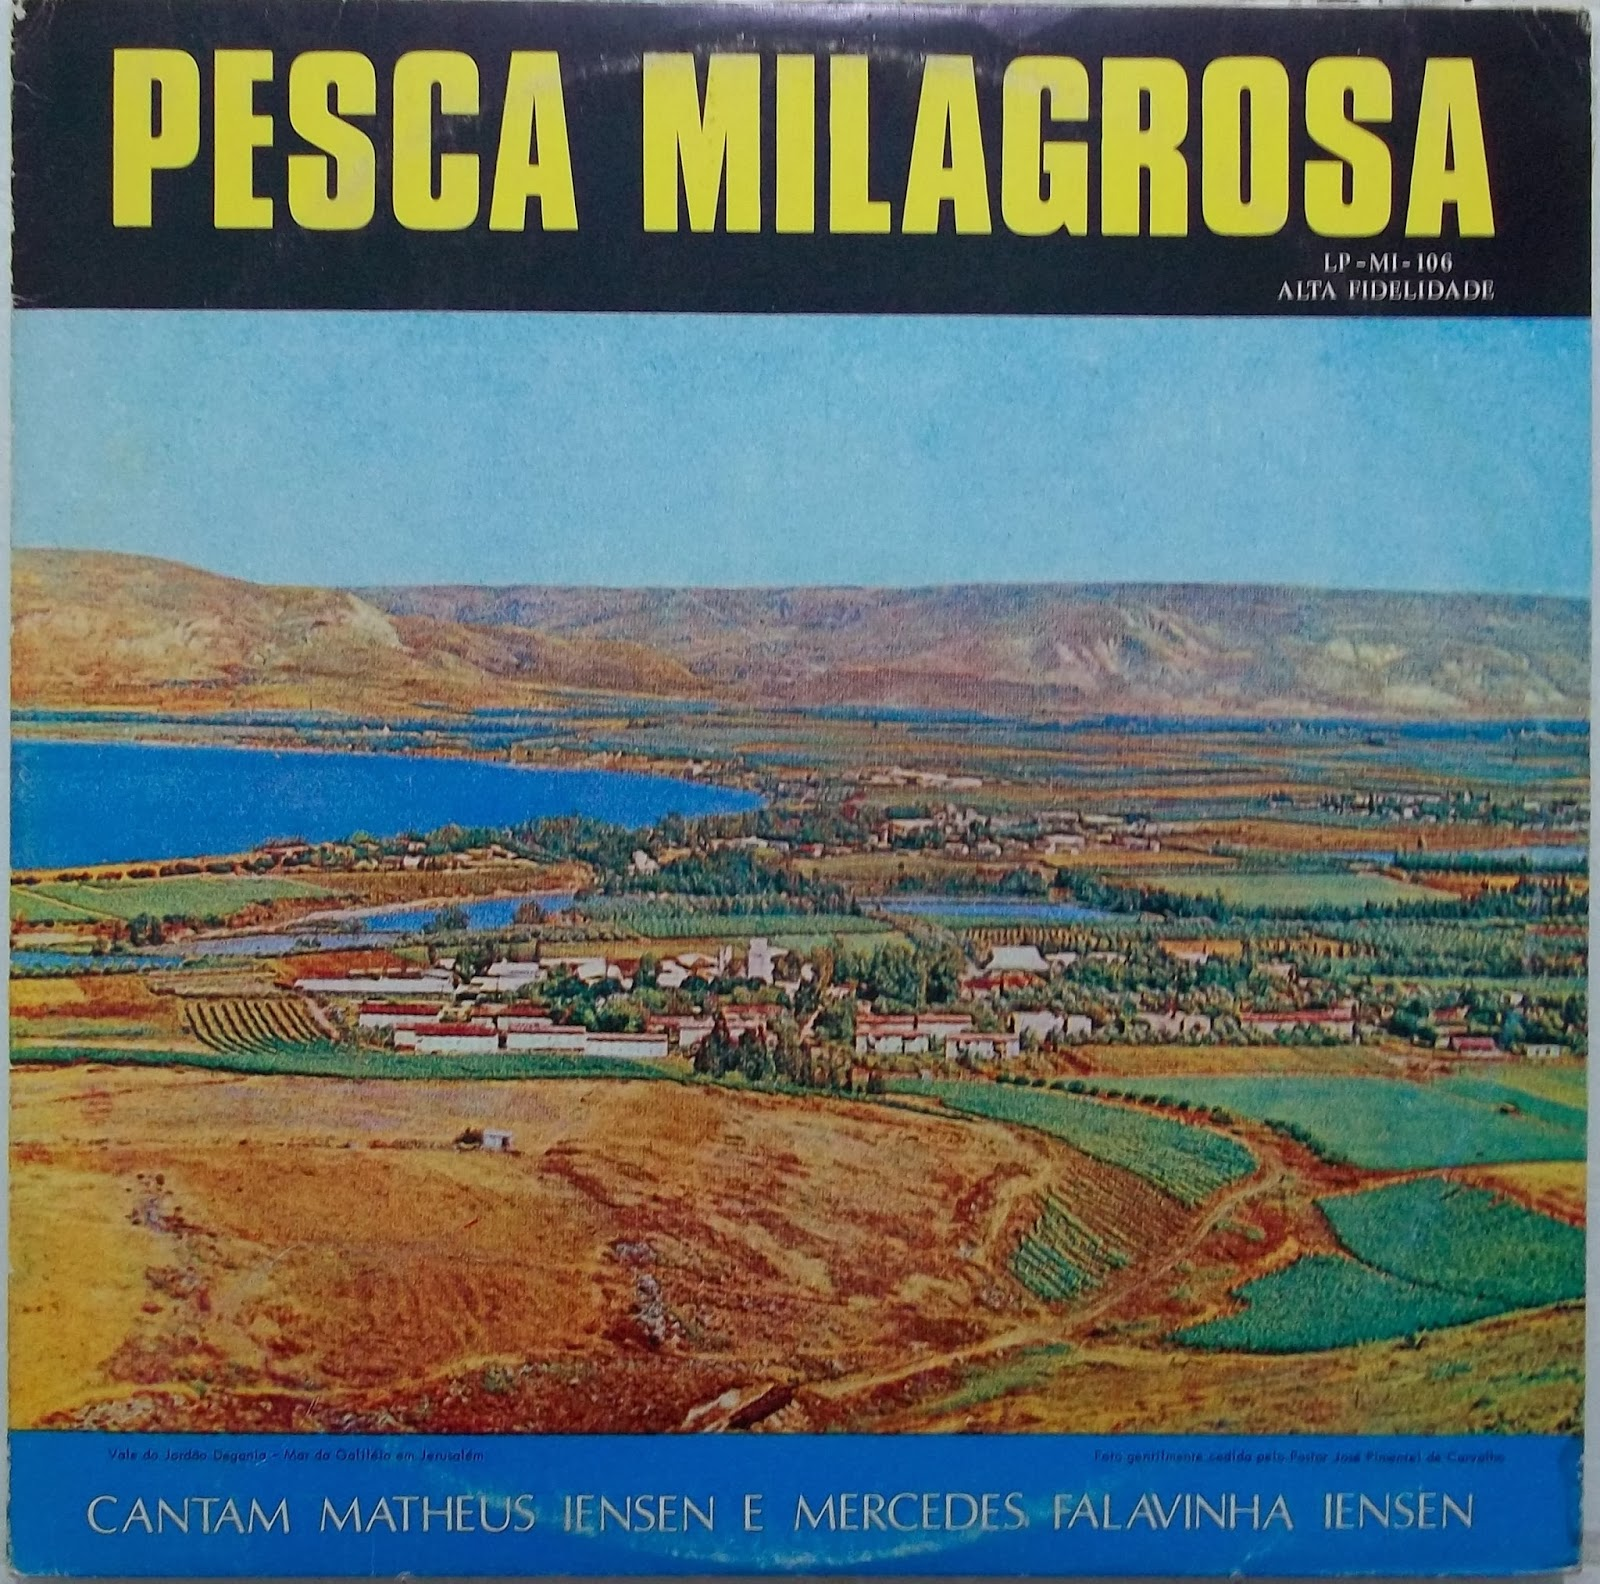 Matheus Iensen e Irm�os Falavinha - Pesca Milagrosa 1970